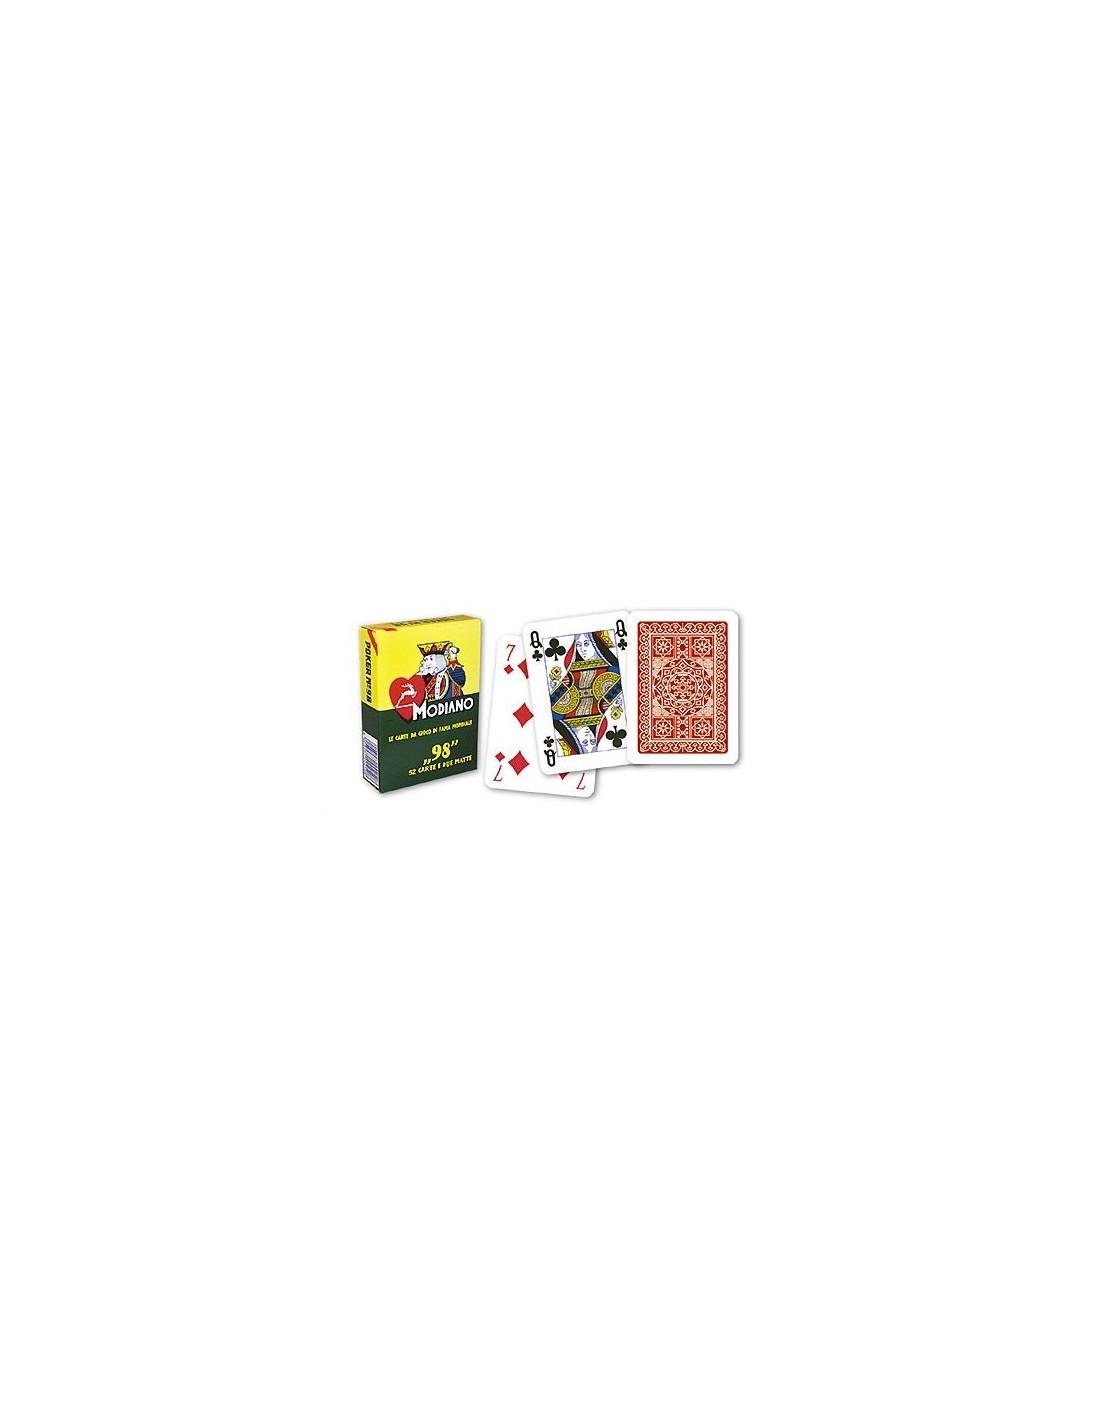 Modiano poker no 98